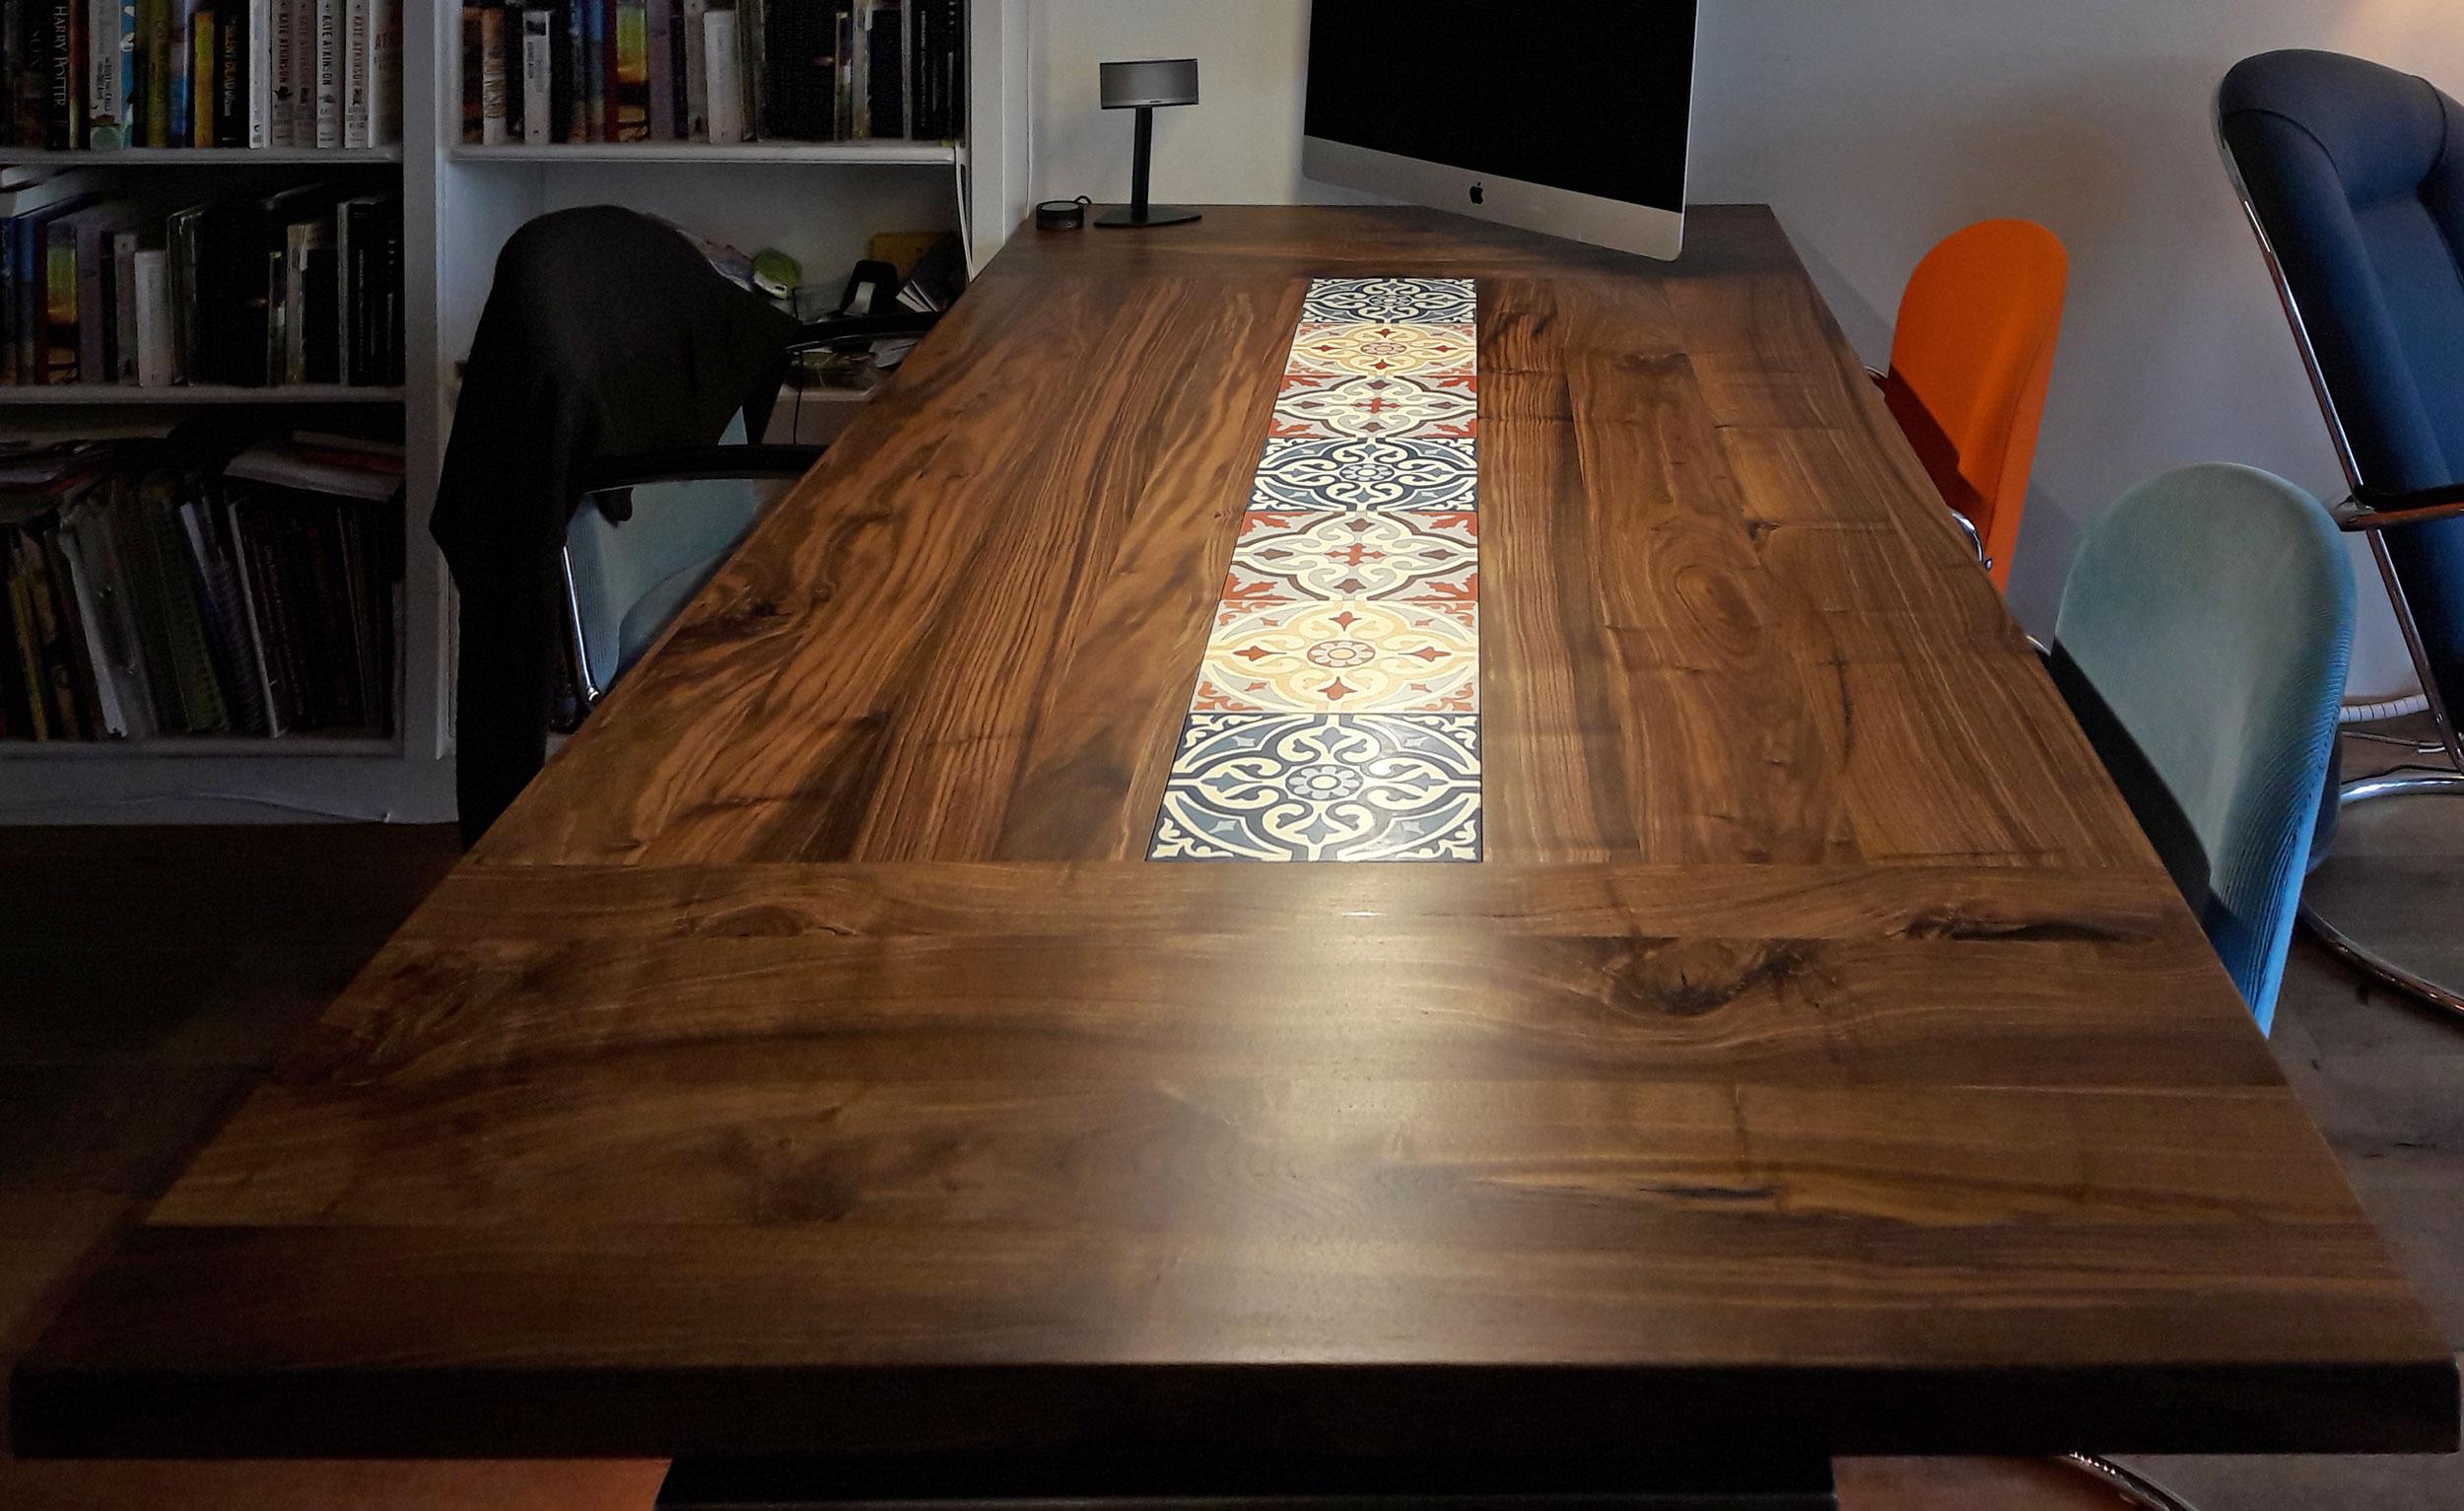 Lex Burki Hornig Holzdesign Gmbh